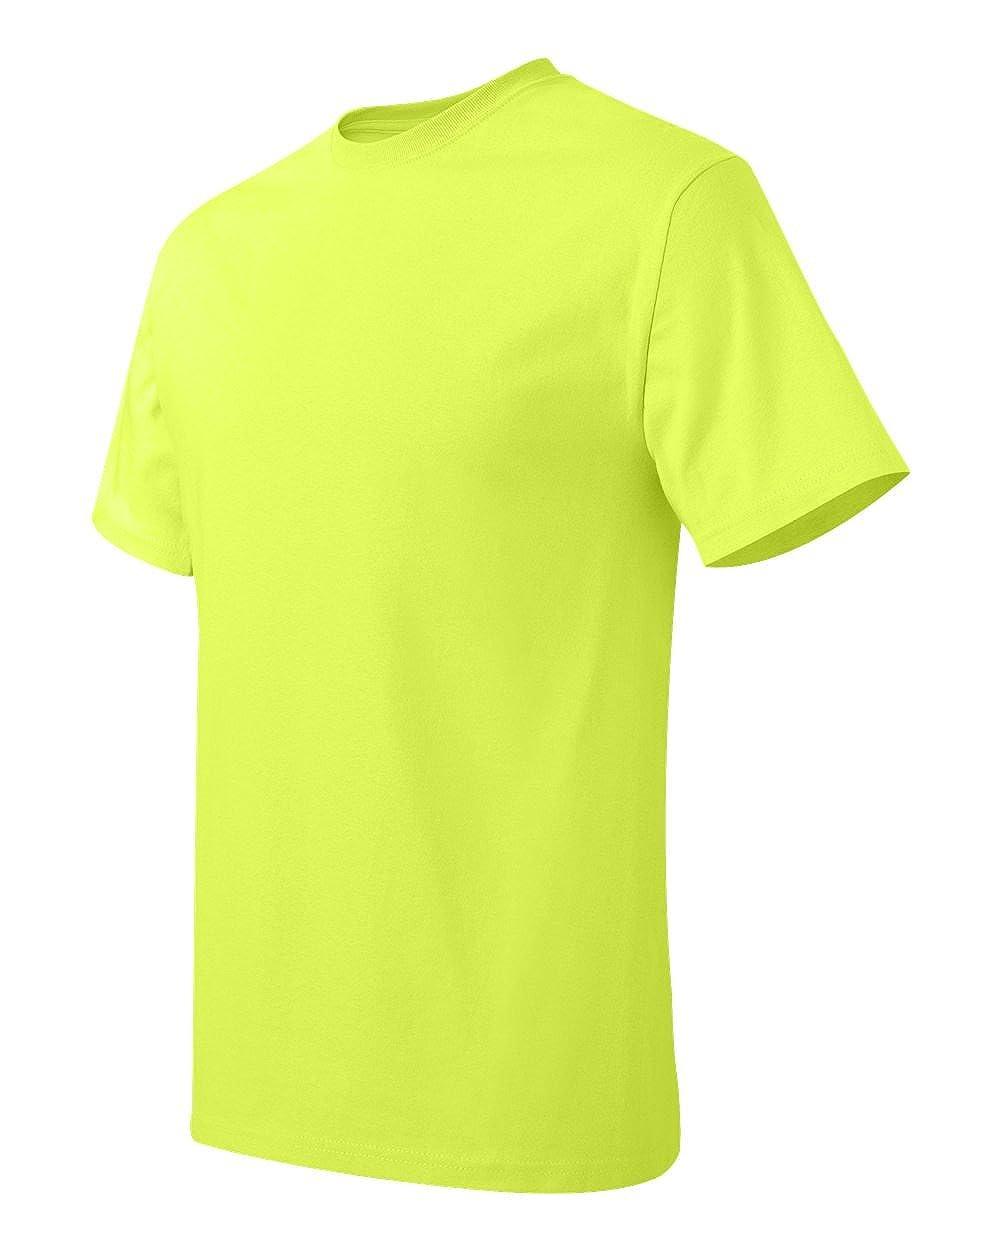 Tagless T-Shirt Hanes mens 6.1 oz -SAFETY GREEN-XL 5250T